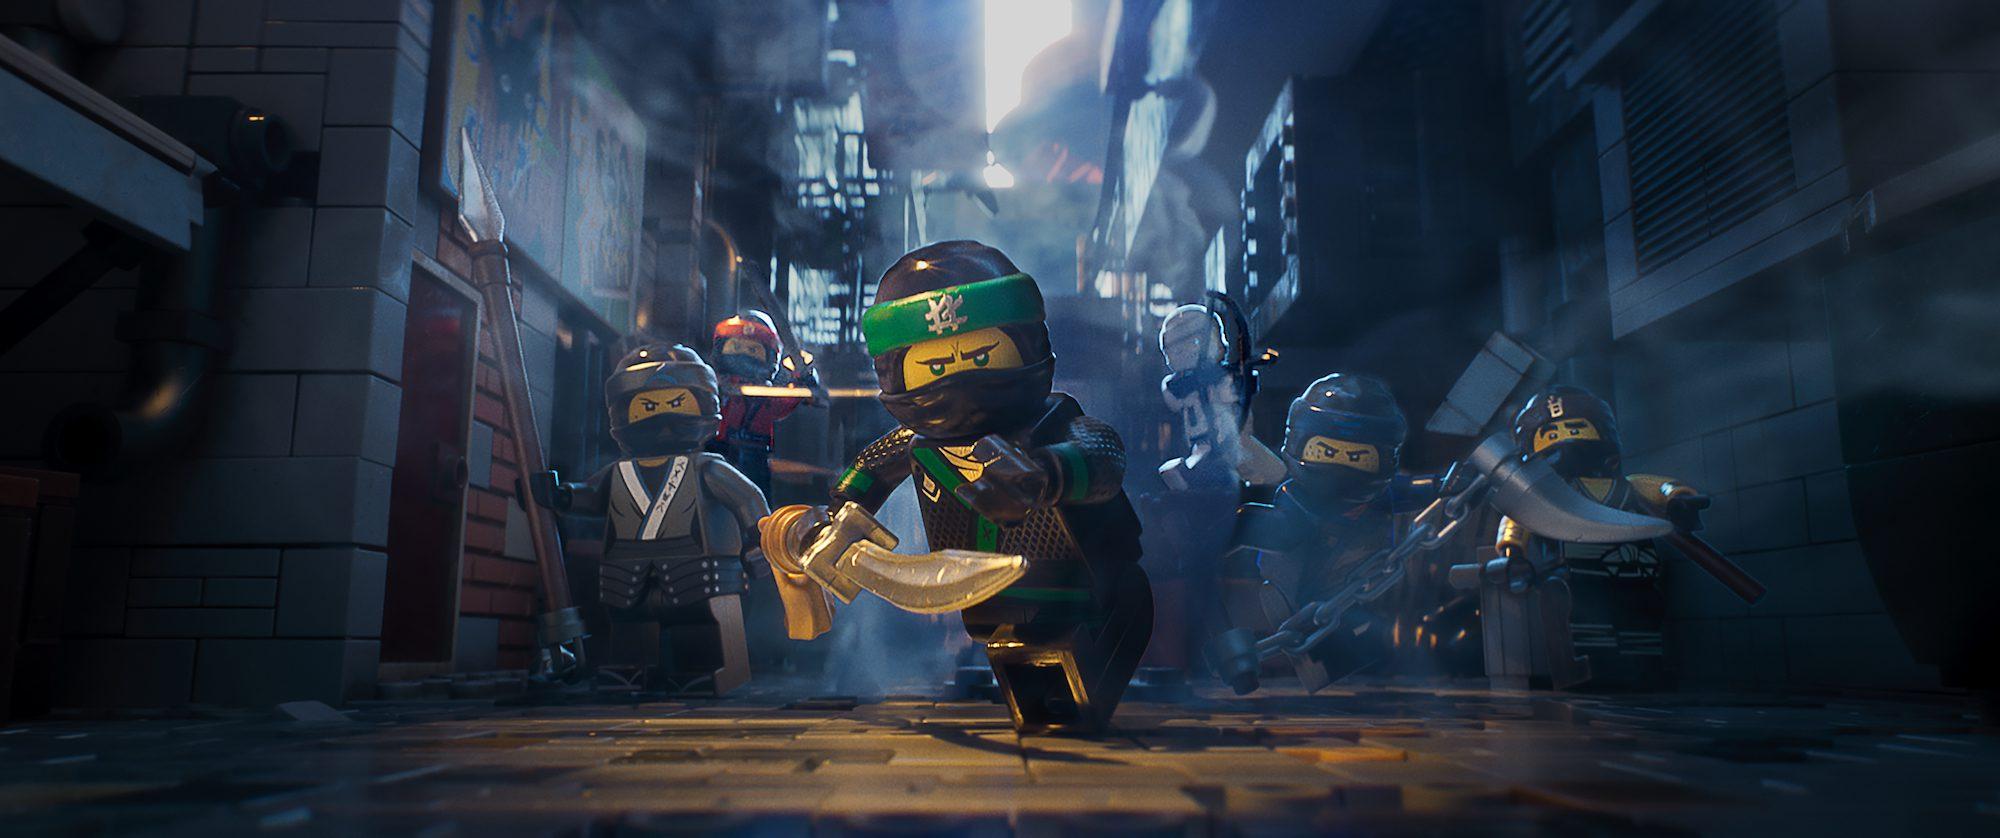 Movie Review The Lego Ninjago Movie Has An Amusing